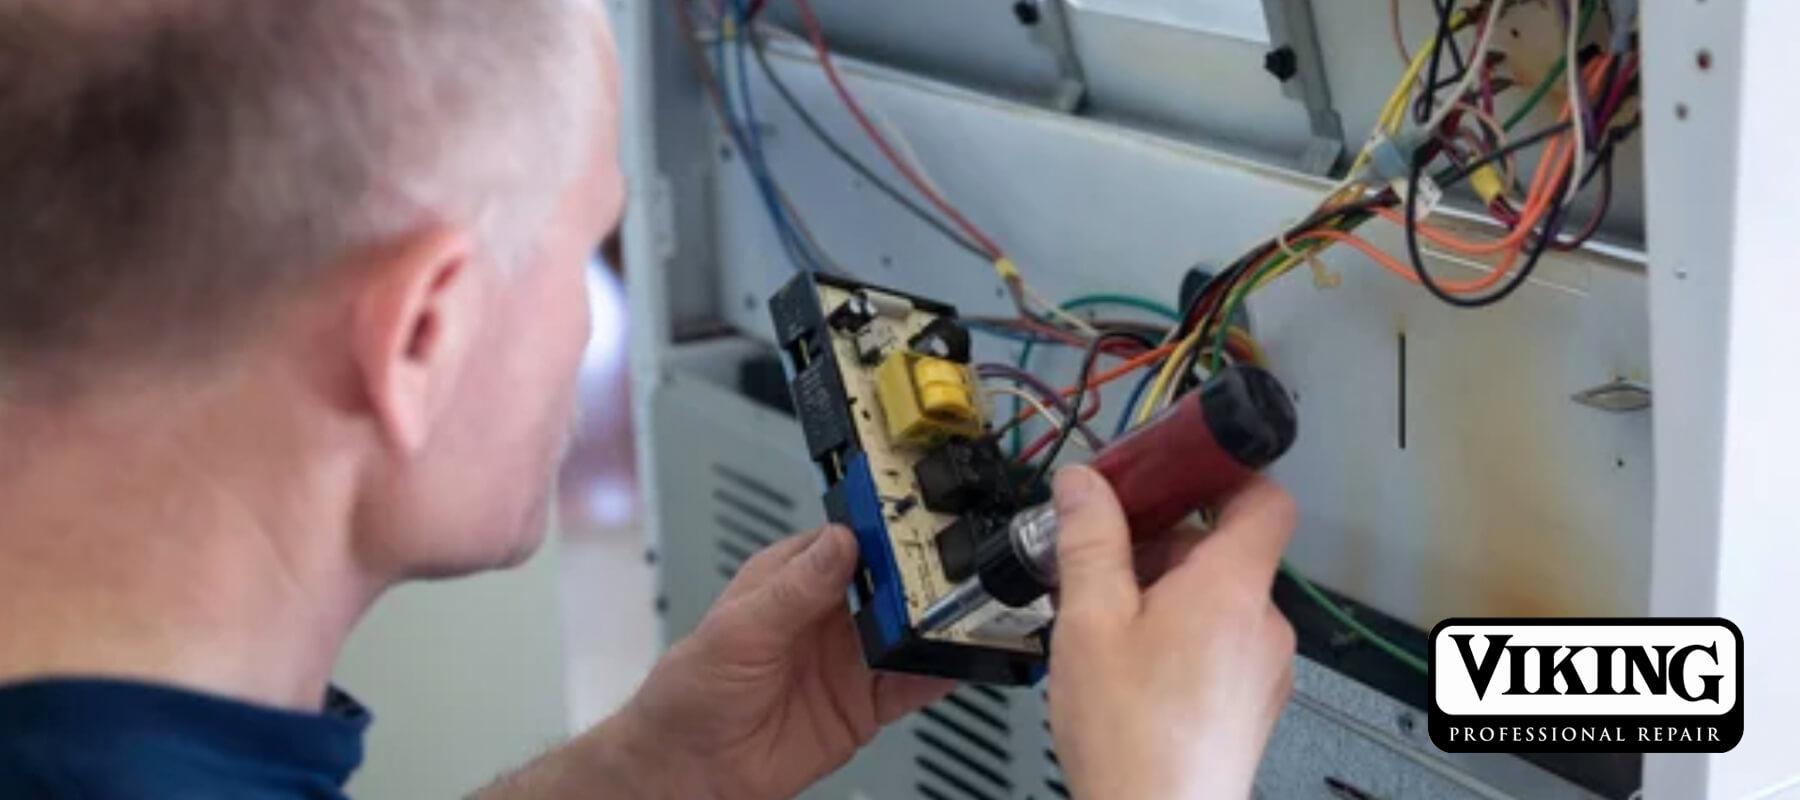 Authorized Viking Appliance Repair Service Thousand Oaks | Professional Viking Repair